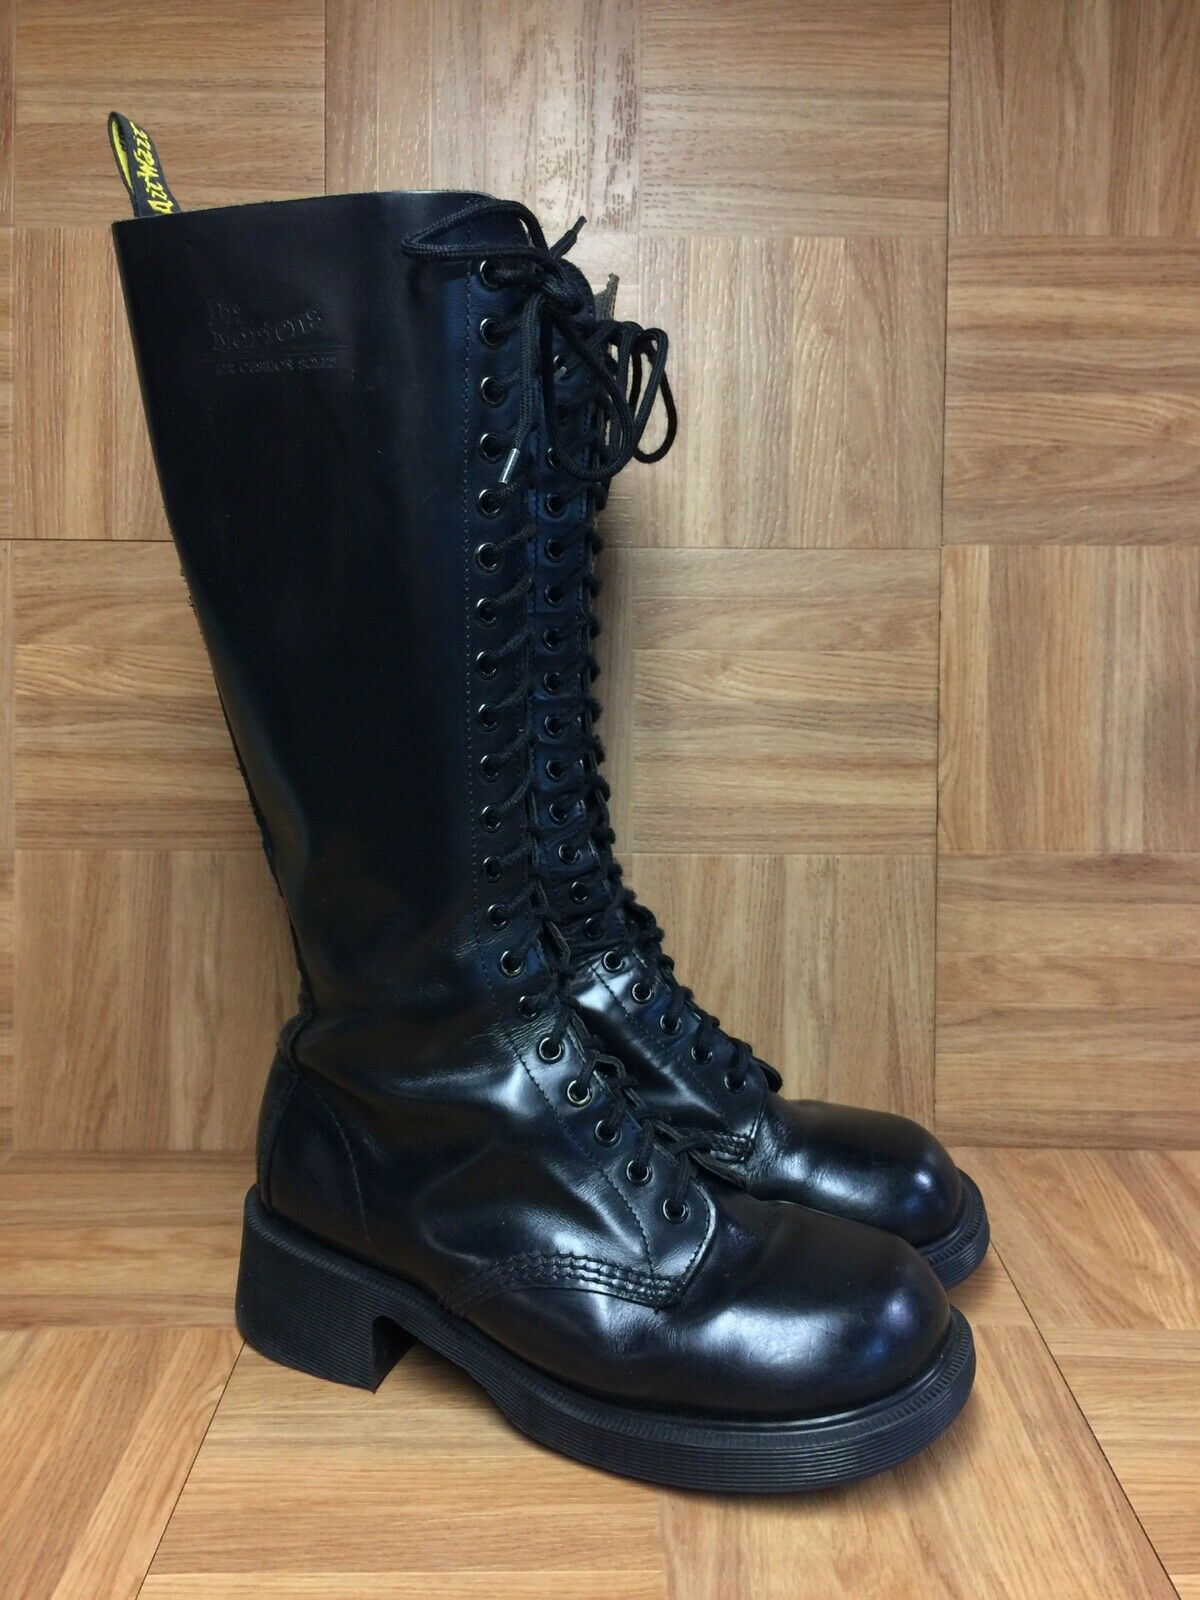 Raro  Dr Martens plataforma botas Altas Cuero Negro 8 para hombres - 9 para mujer de Inglaterra